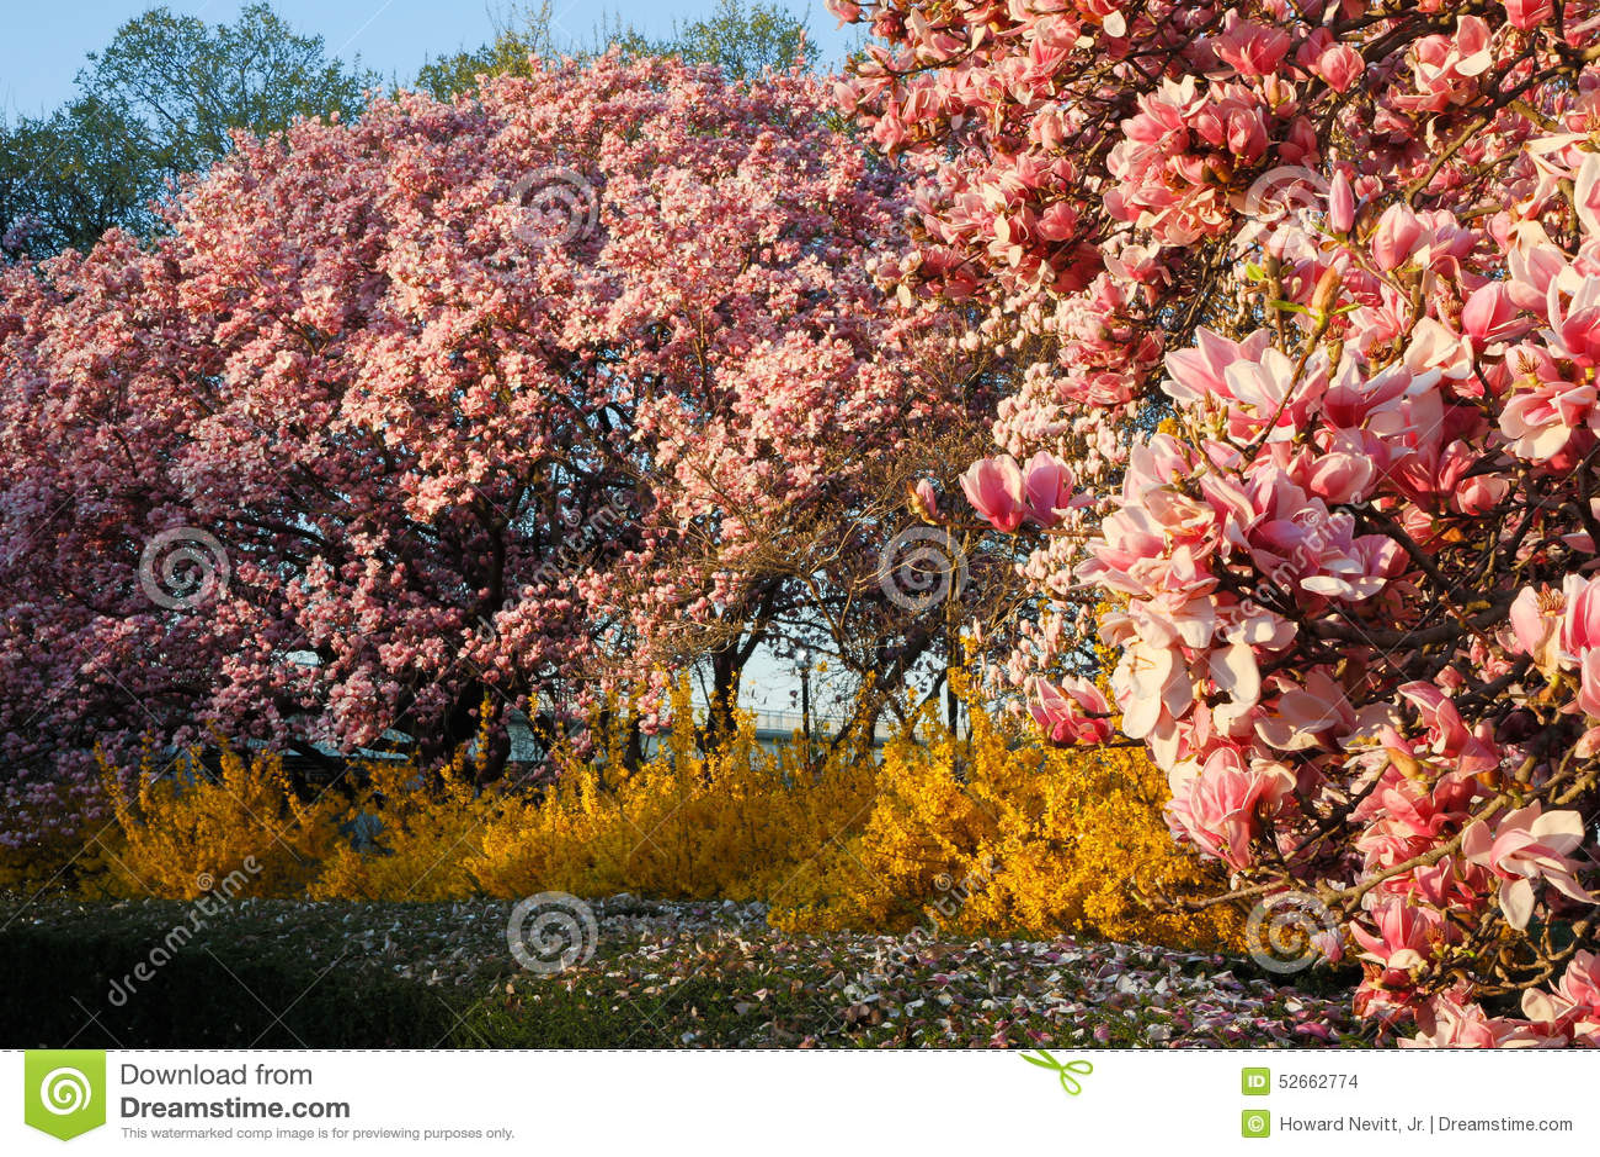 Magnolia Trees And Forsythia Bushes Stock Photo Image Of Magnolia